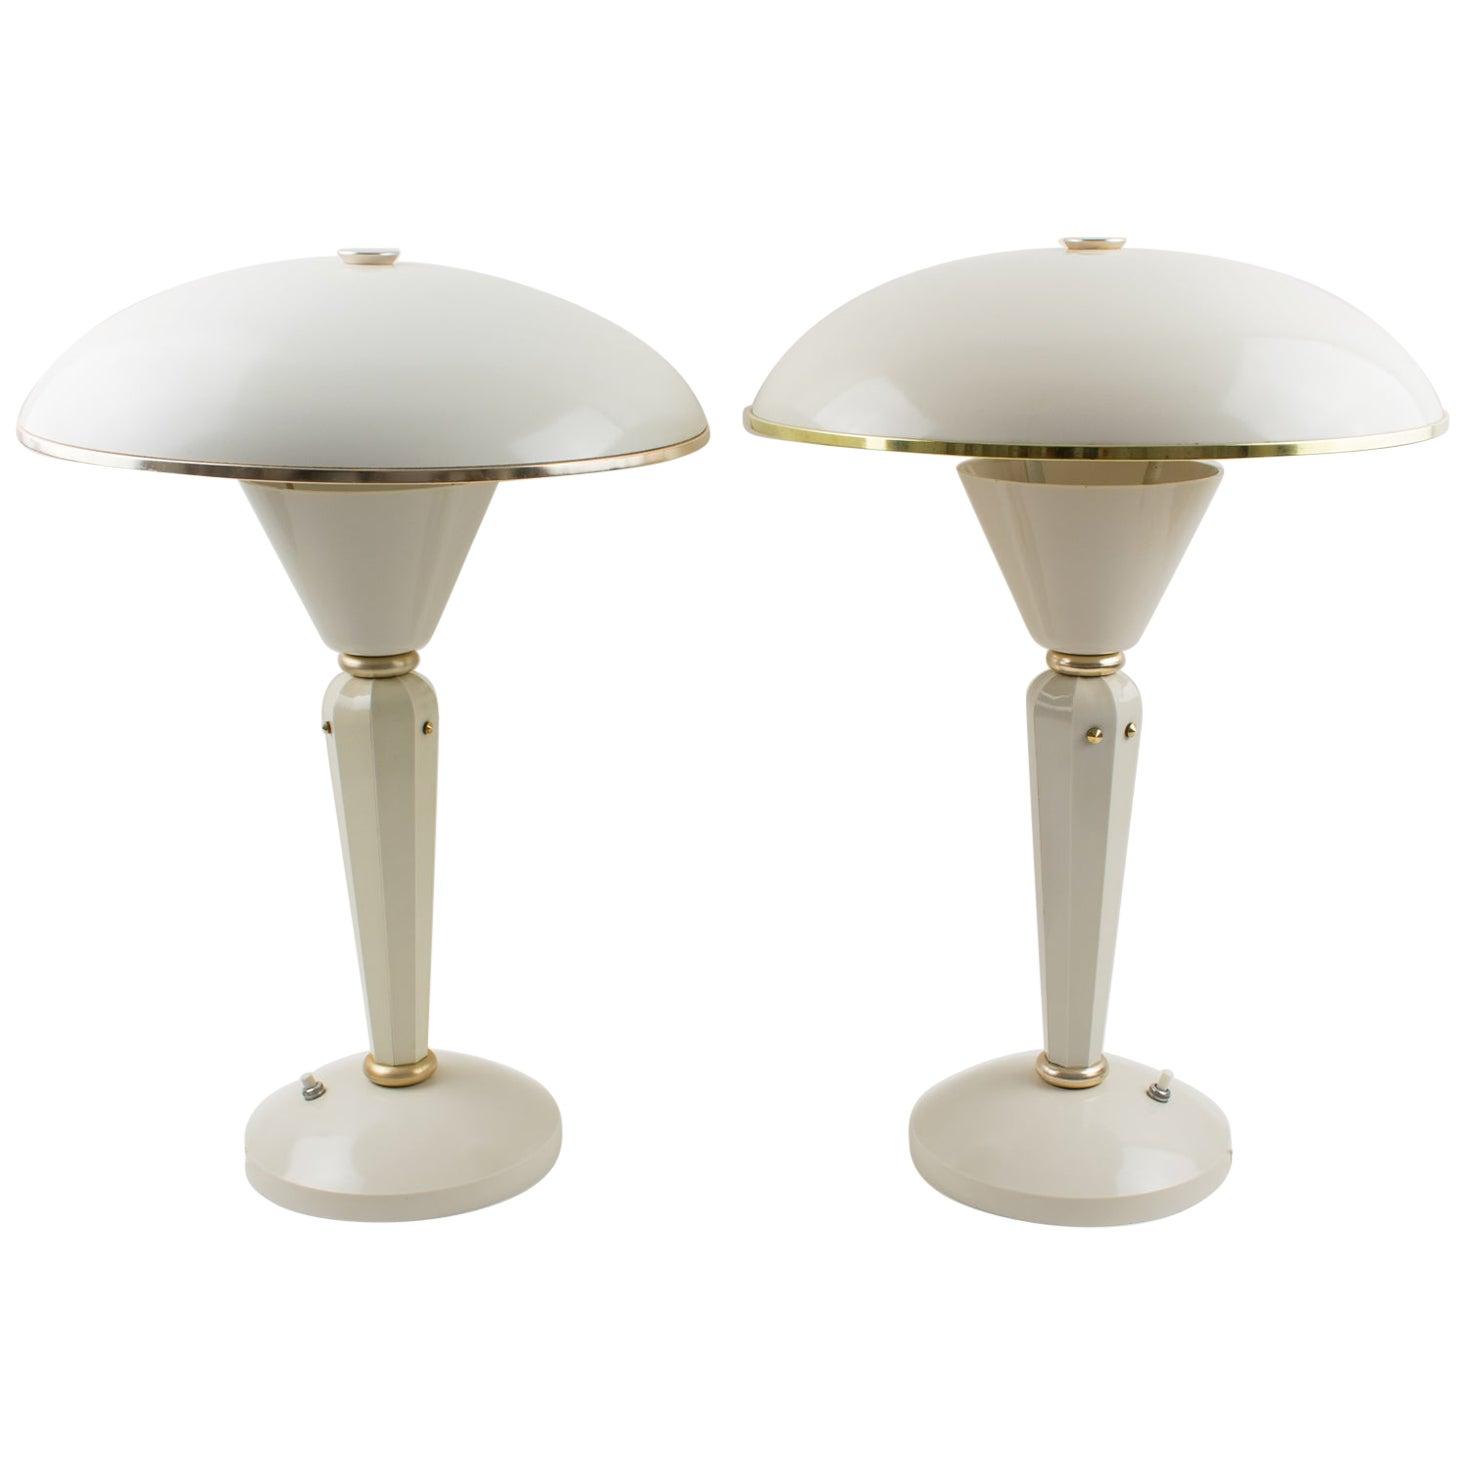 Eileen Gray for Jumo Art Deco Bakelite Table Lamp, a pair